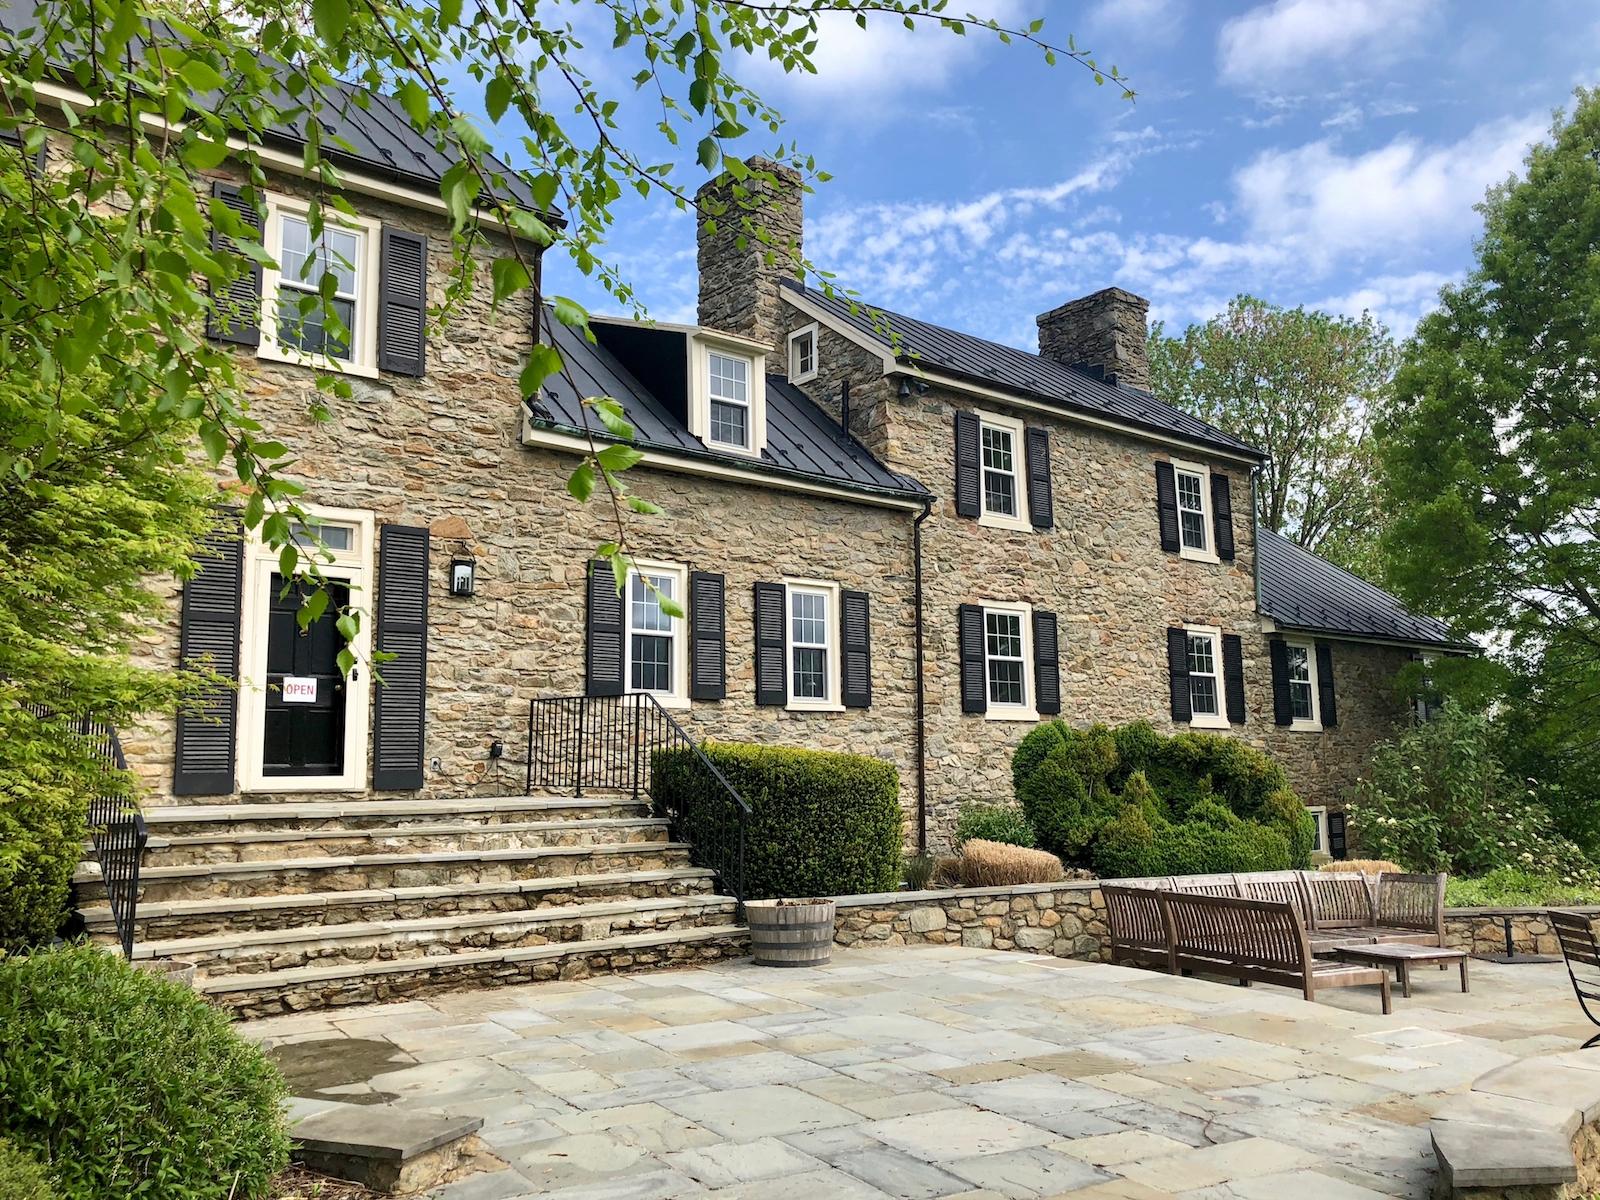 WINE_Greenhill Manor House.jpg